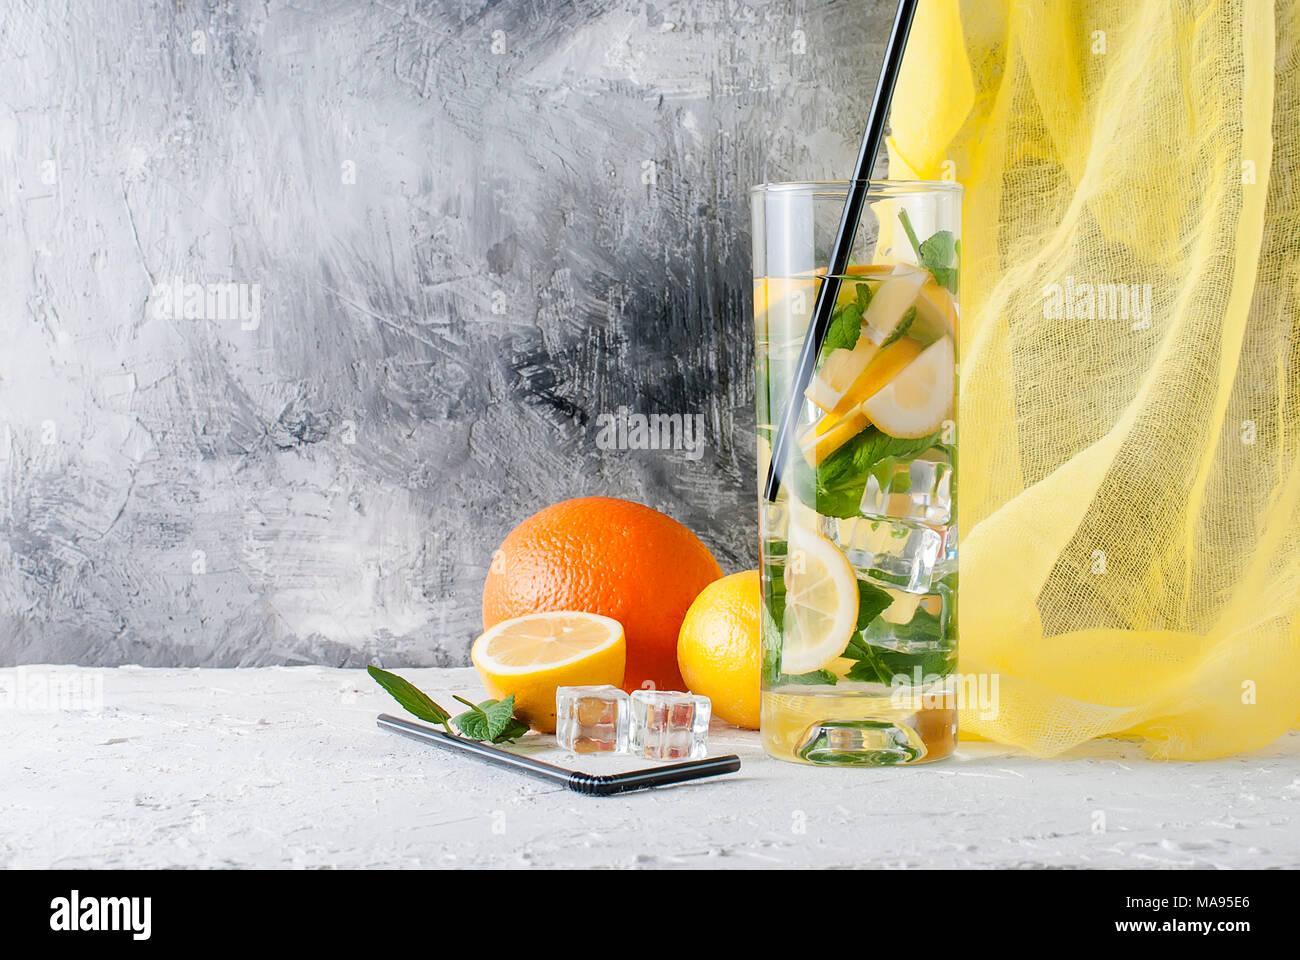 Fresh homemade lemonade in glass with lemon, orange, ice and mint. Ingredients for lemonade. - Stock Image